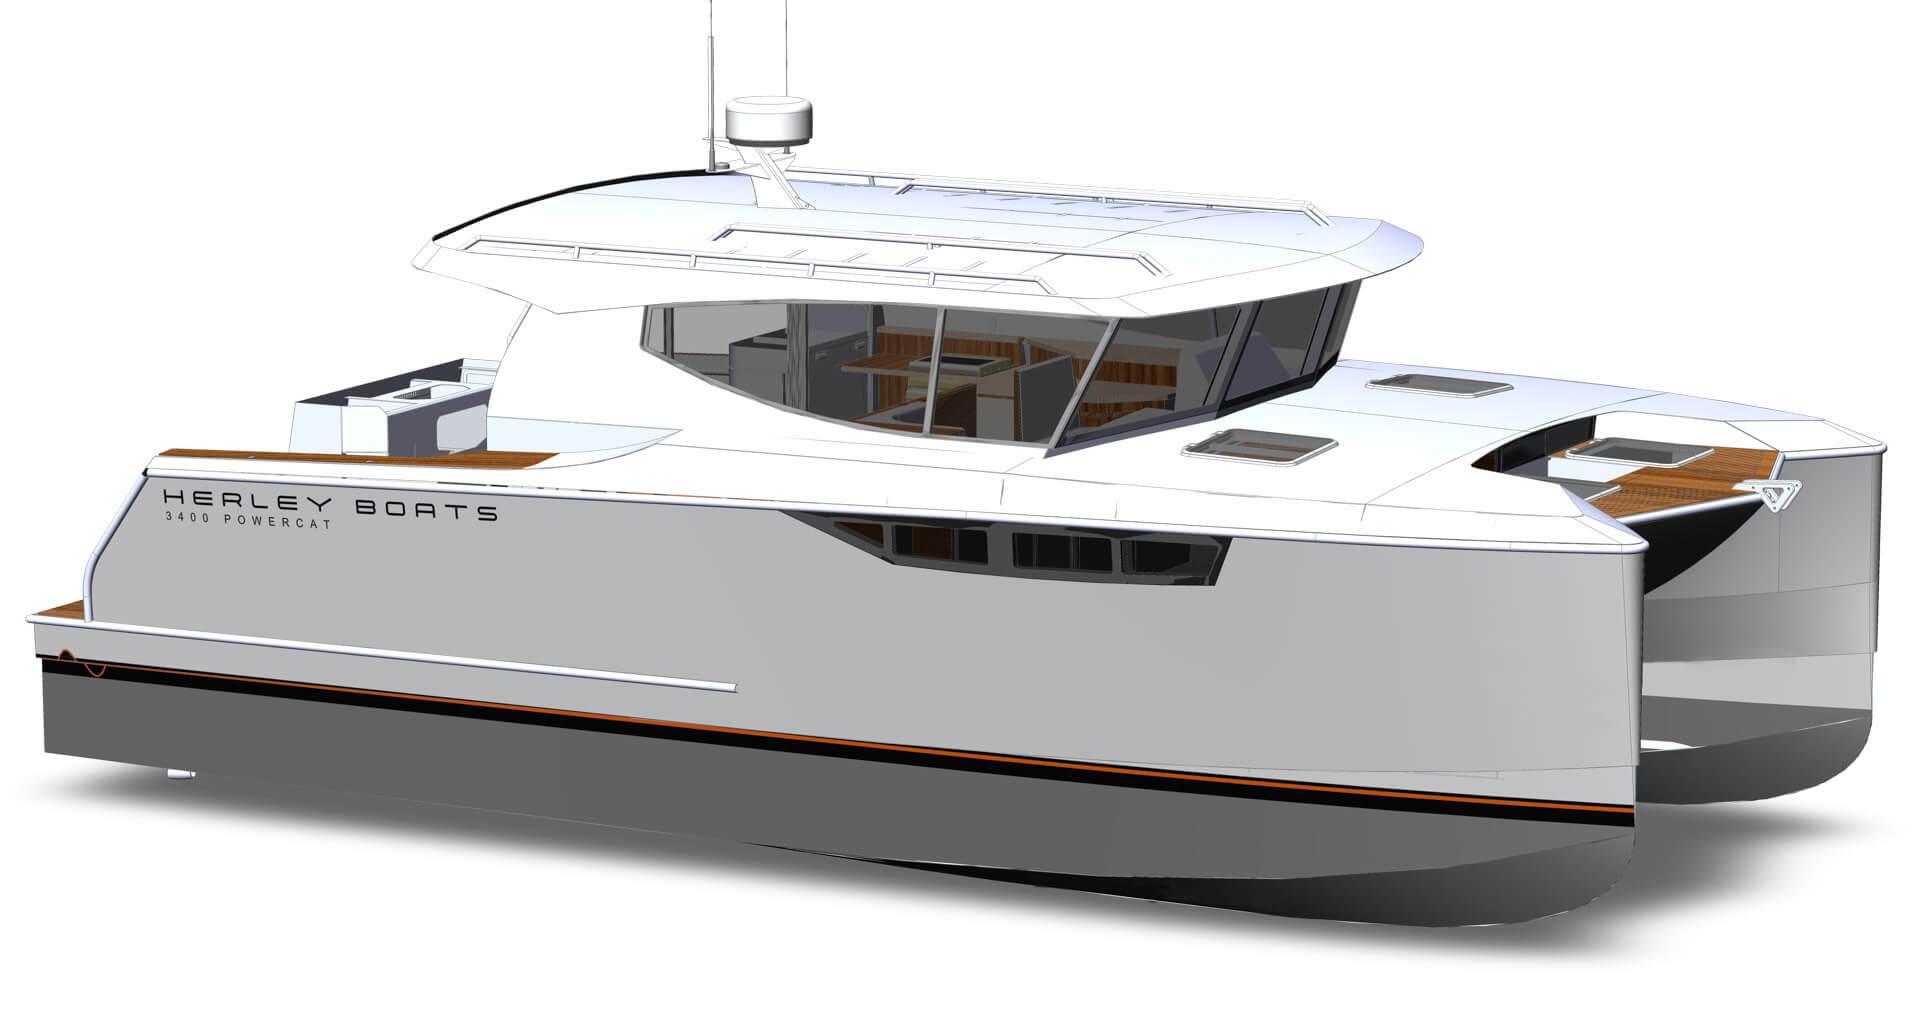 Herley Boats Hybrid Catamaran Powercat 3400